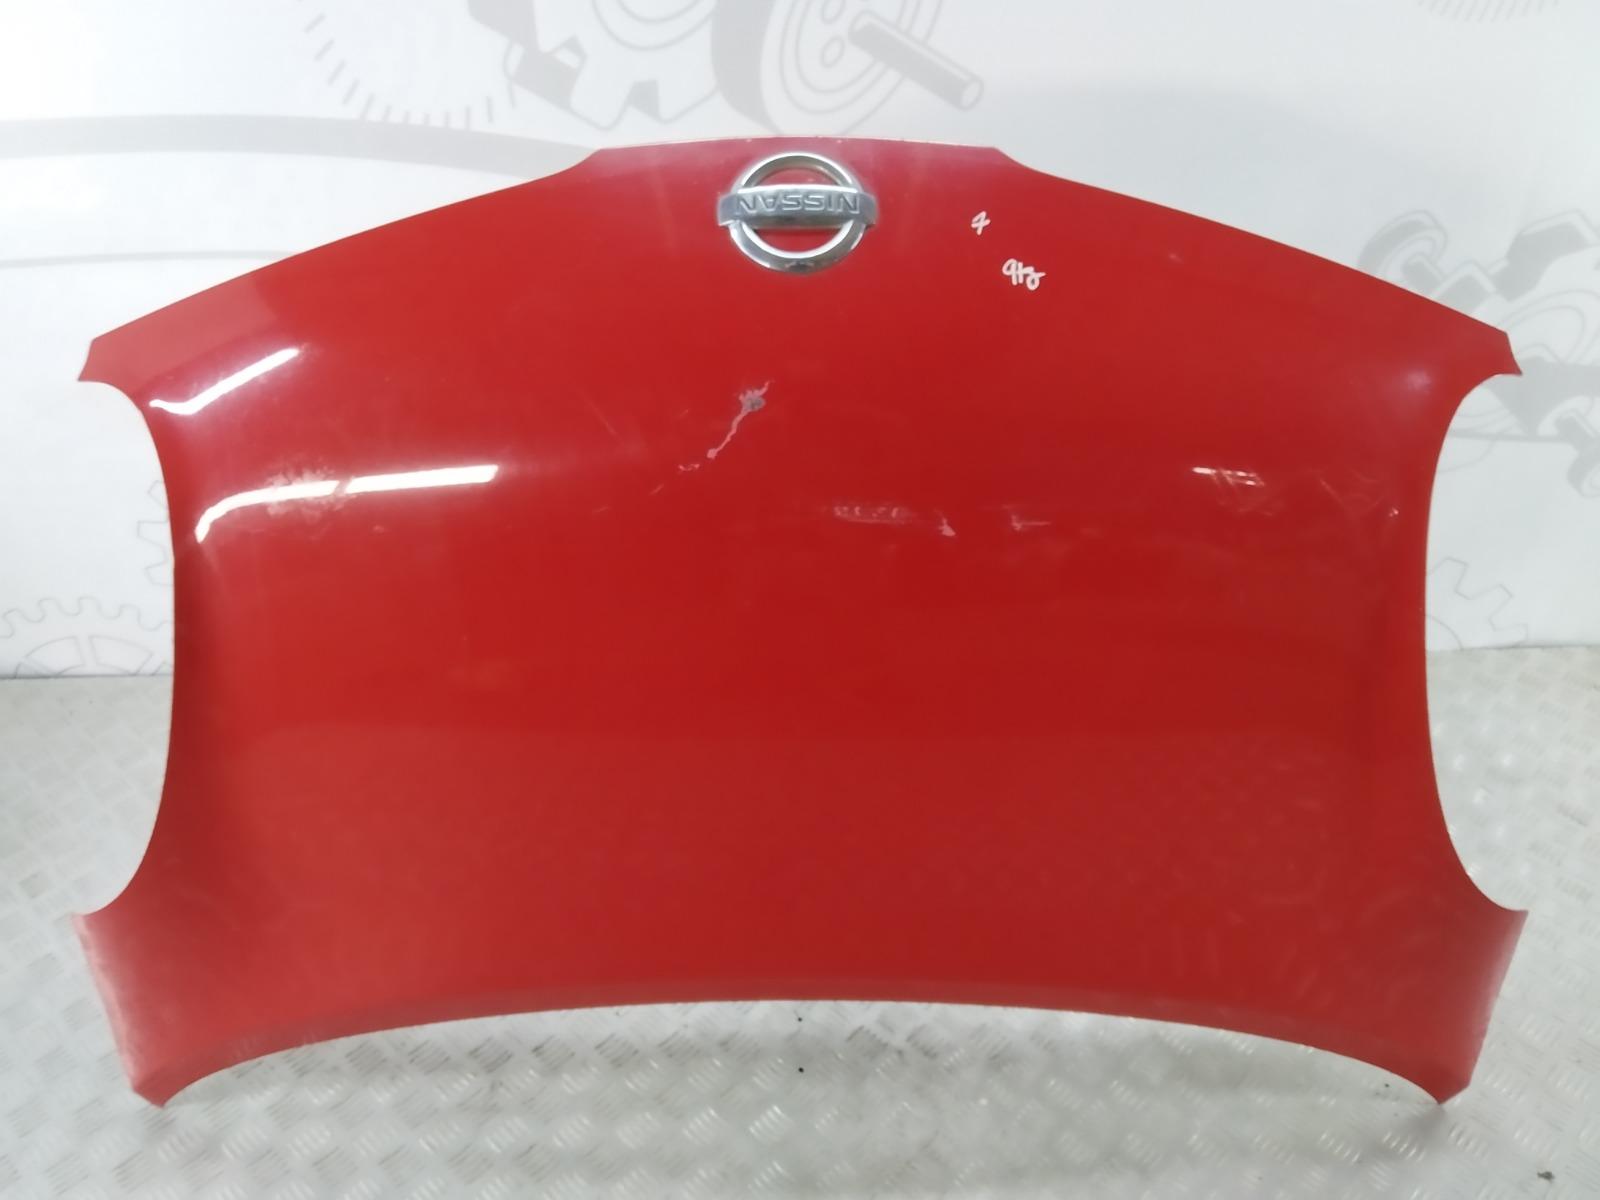 Капот Nissan Micra K12 1.0 I 2003 (б/у)